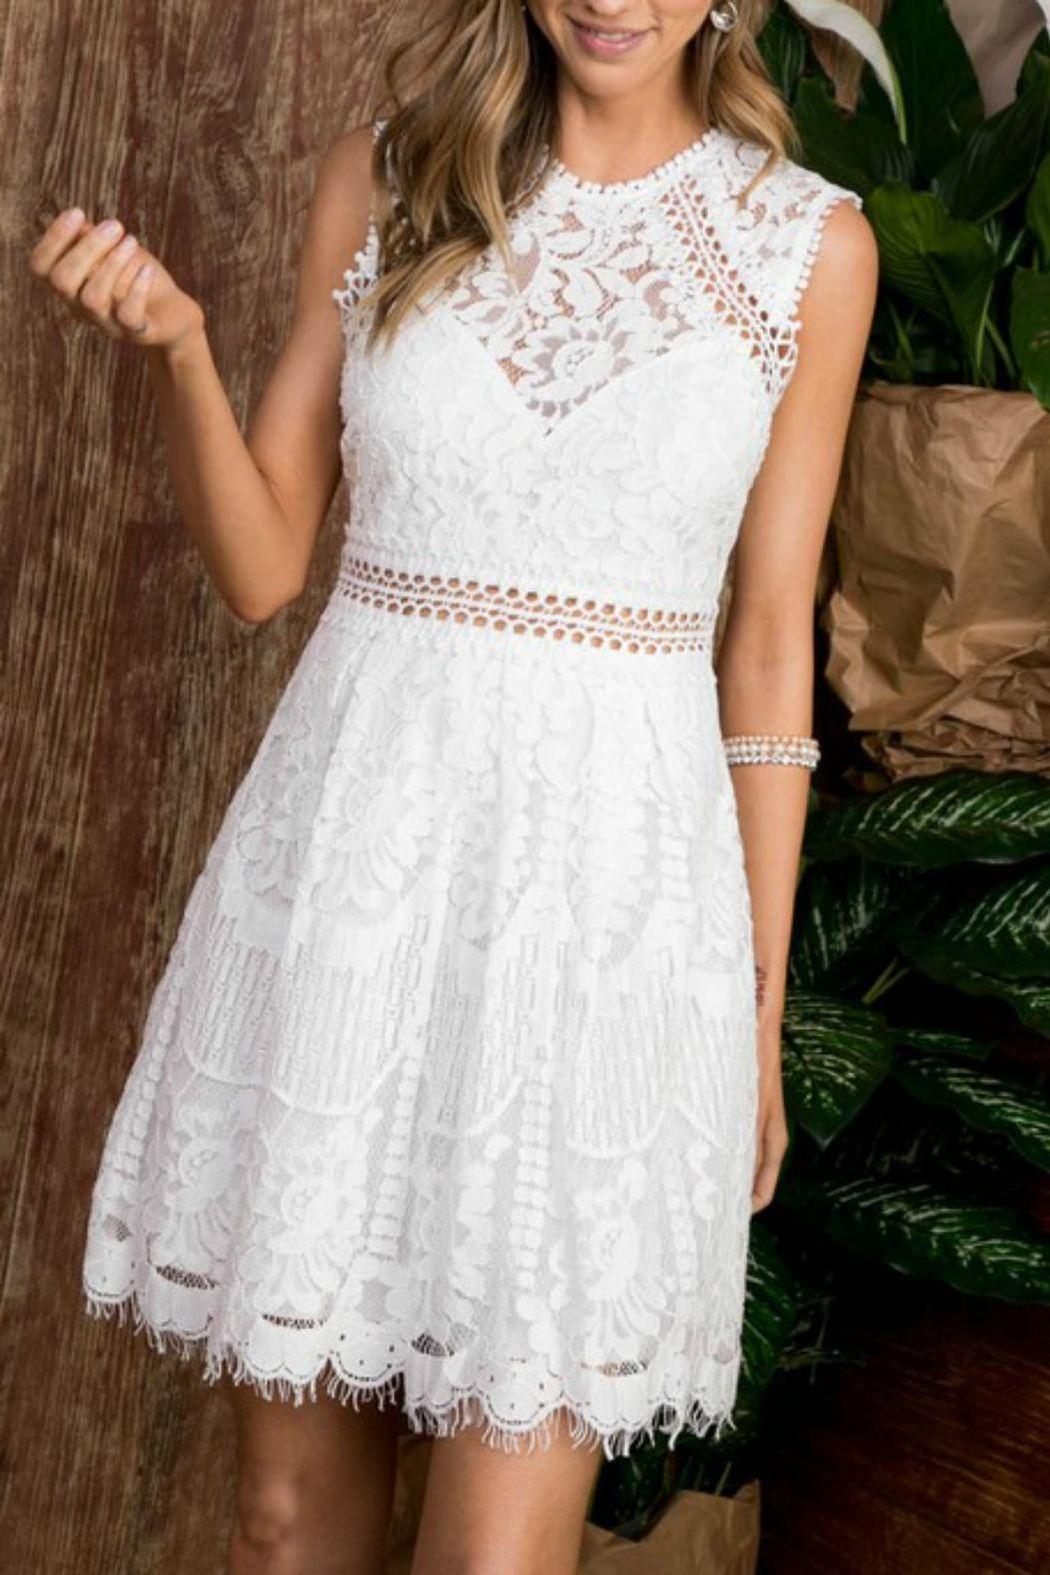 Lace Flare Dress White Lace Dress Short Lace White Dress Lace Summer Dresses [ 1575 x 1050 Pixel ]